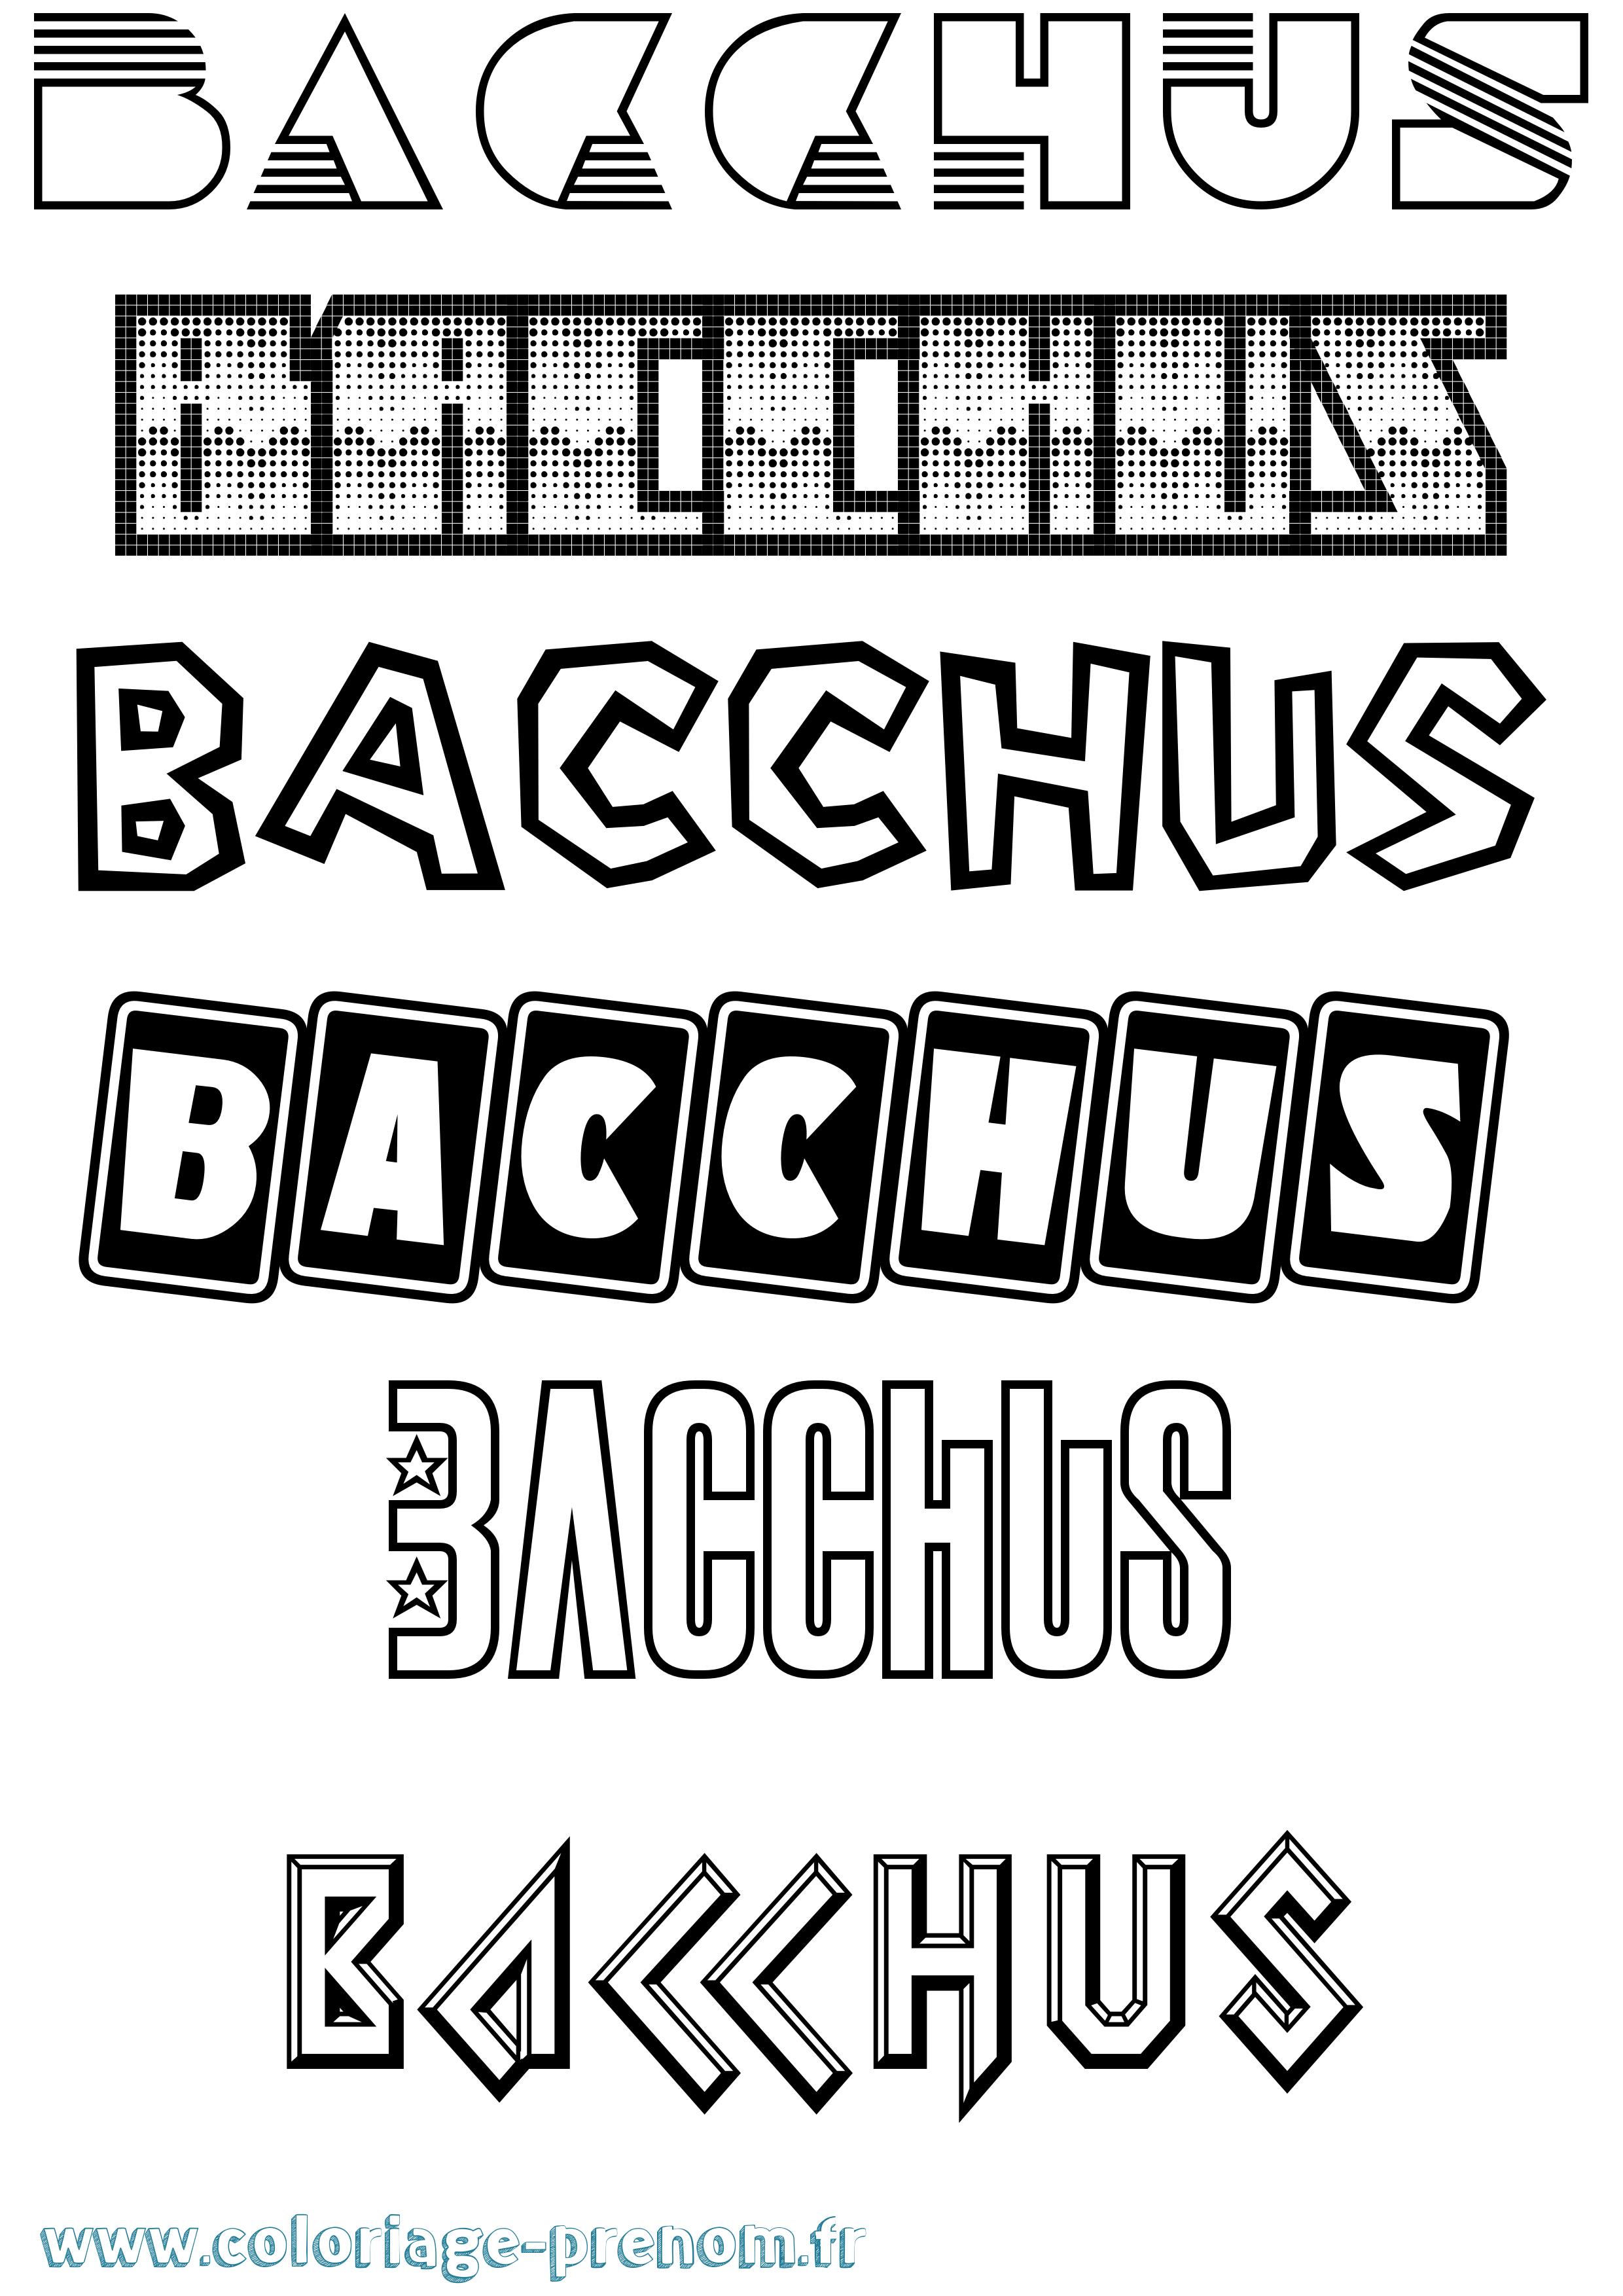 bacchus dessin coloriage